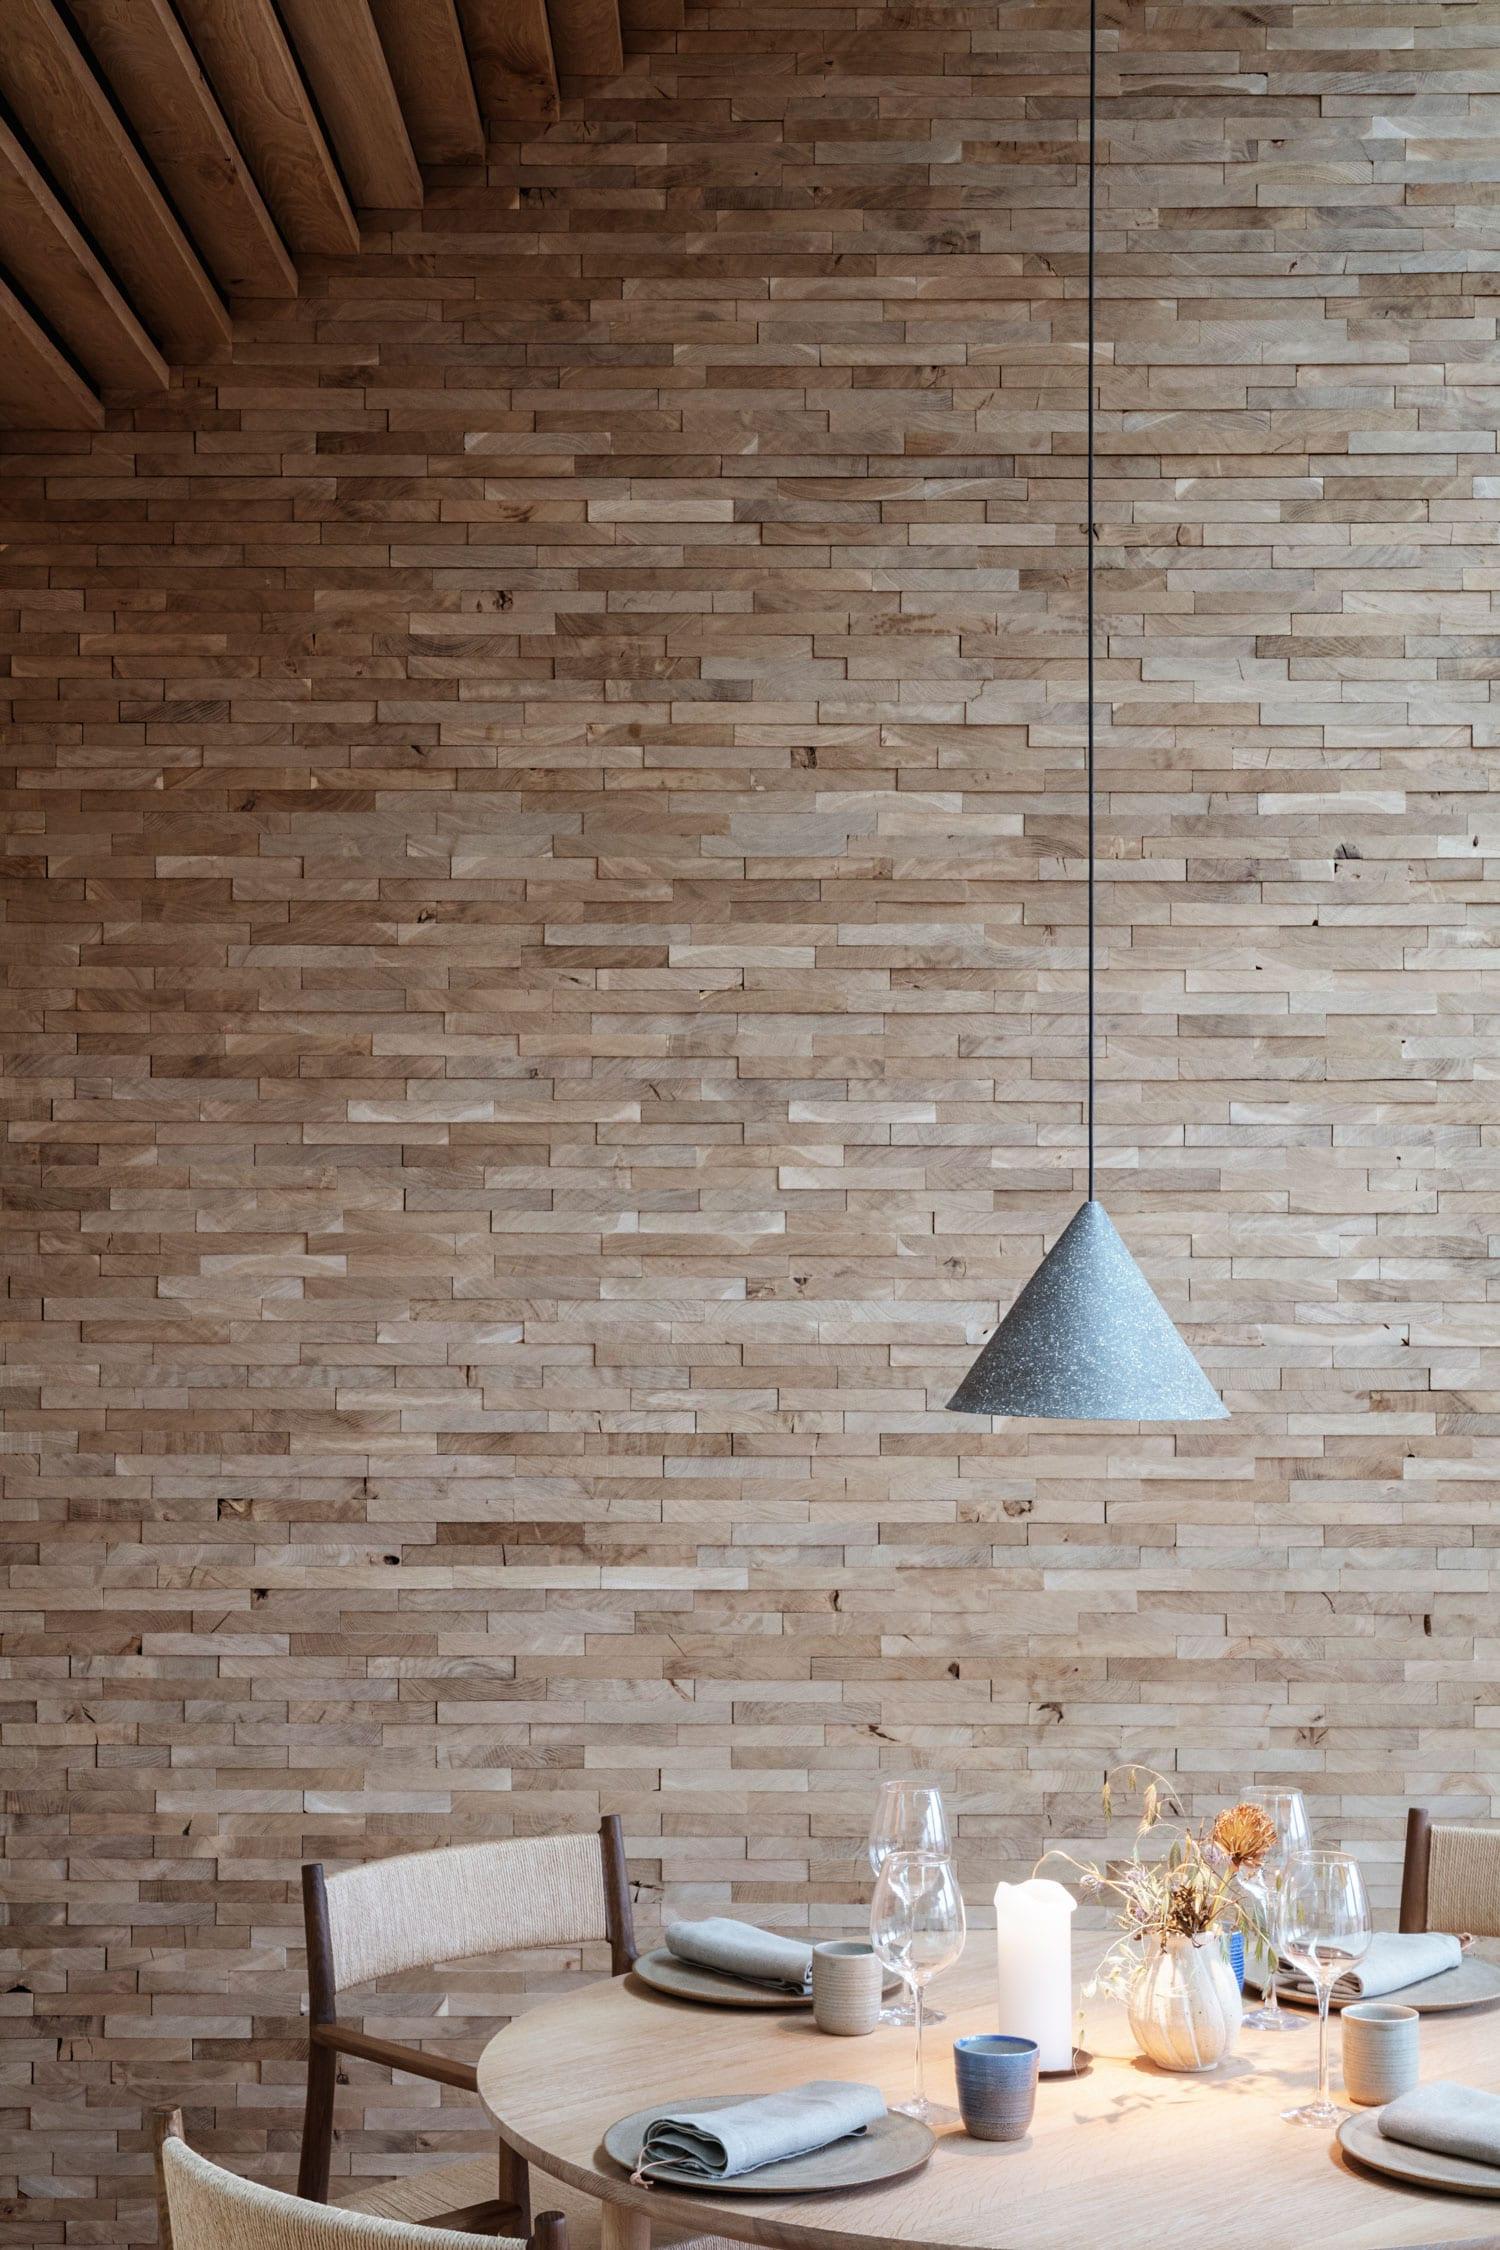 Noma Restaurant in Copenhagen by Studio Thulstrup | Yellowtrace